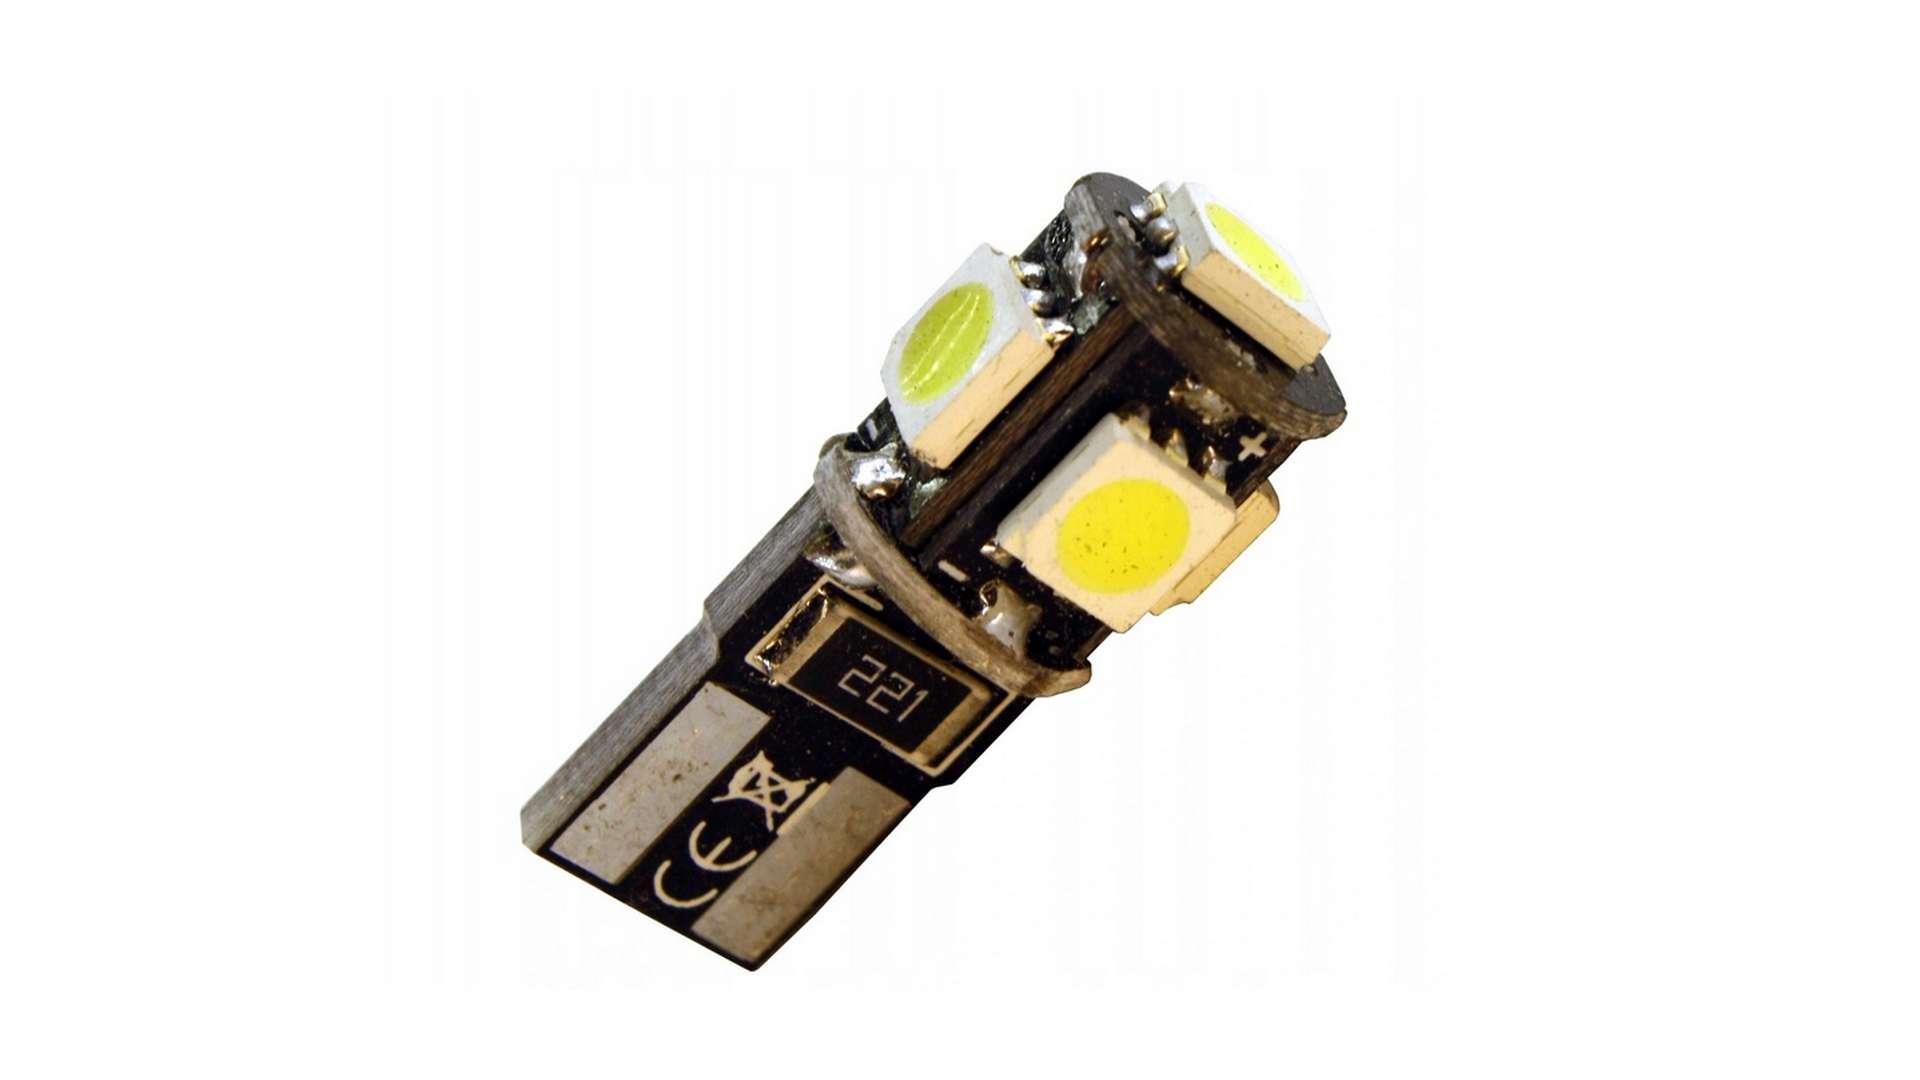 LED LED W5W 5x5050 SMD Cold white CANBUS